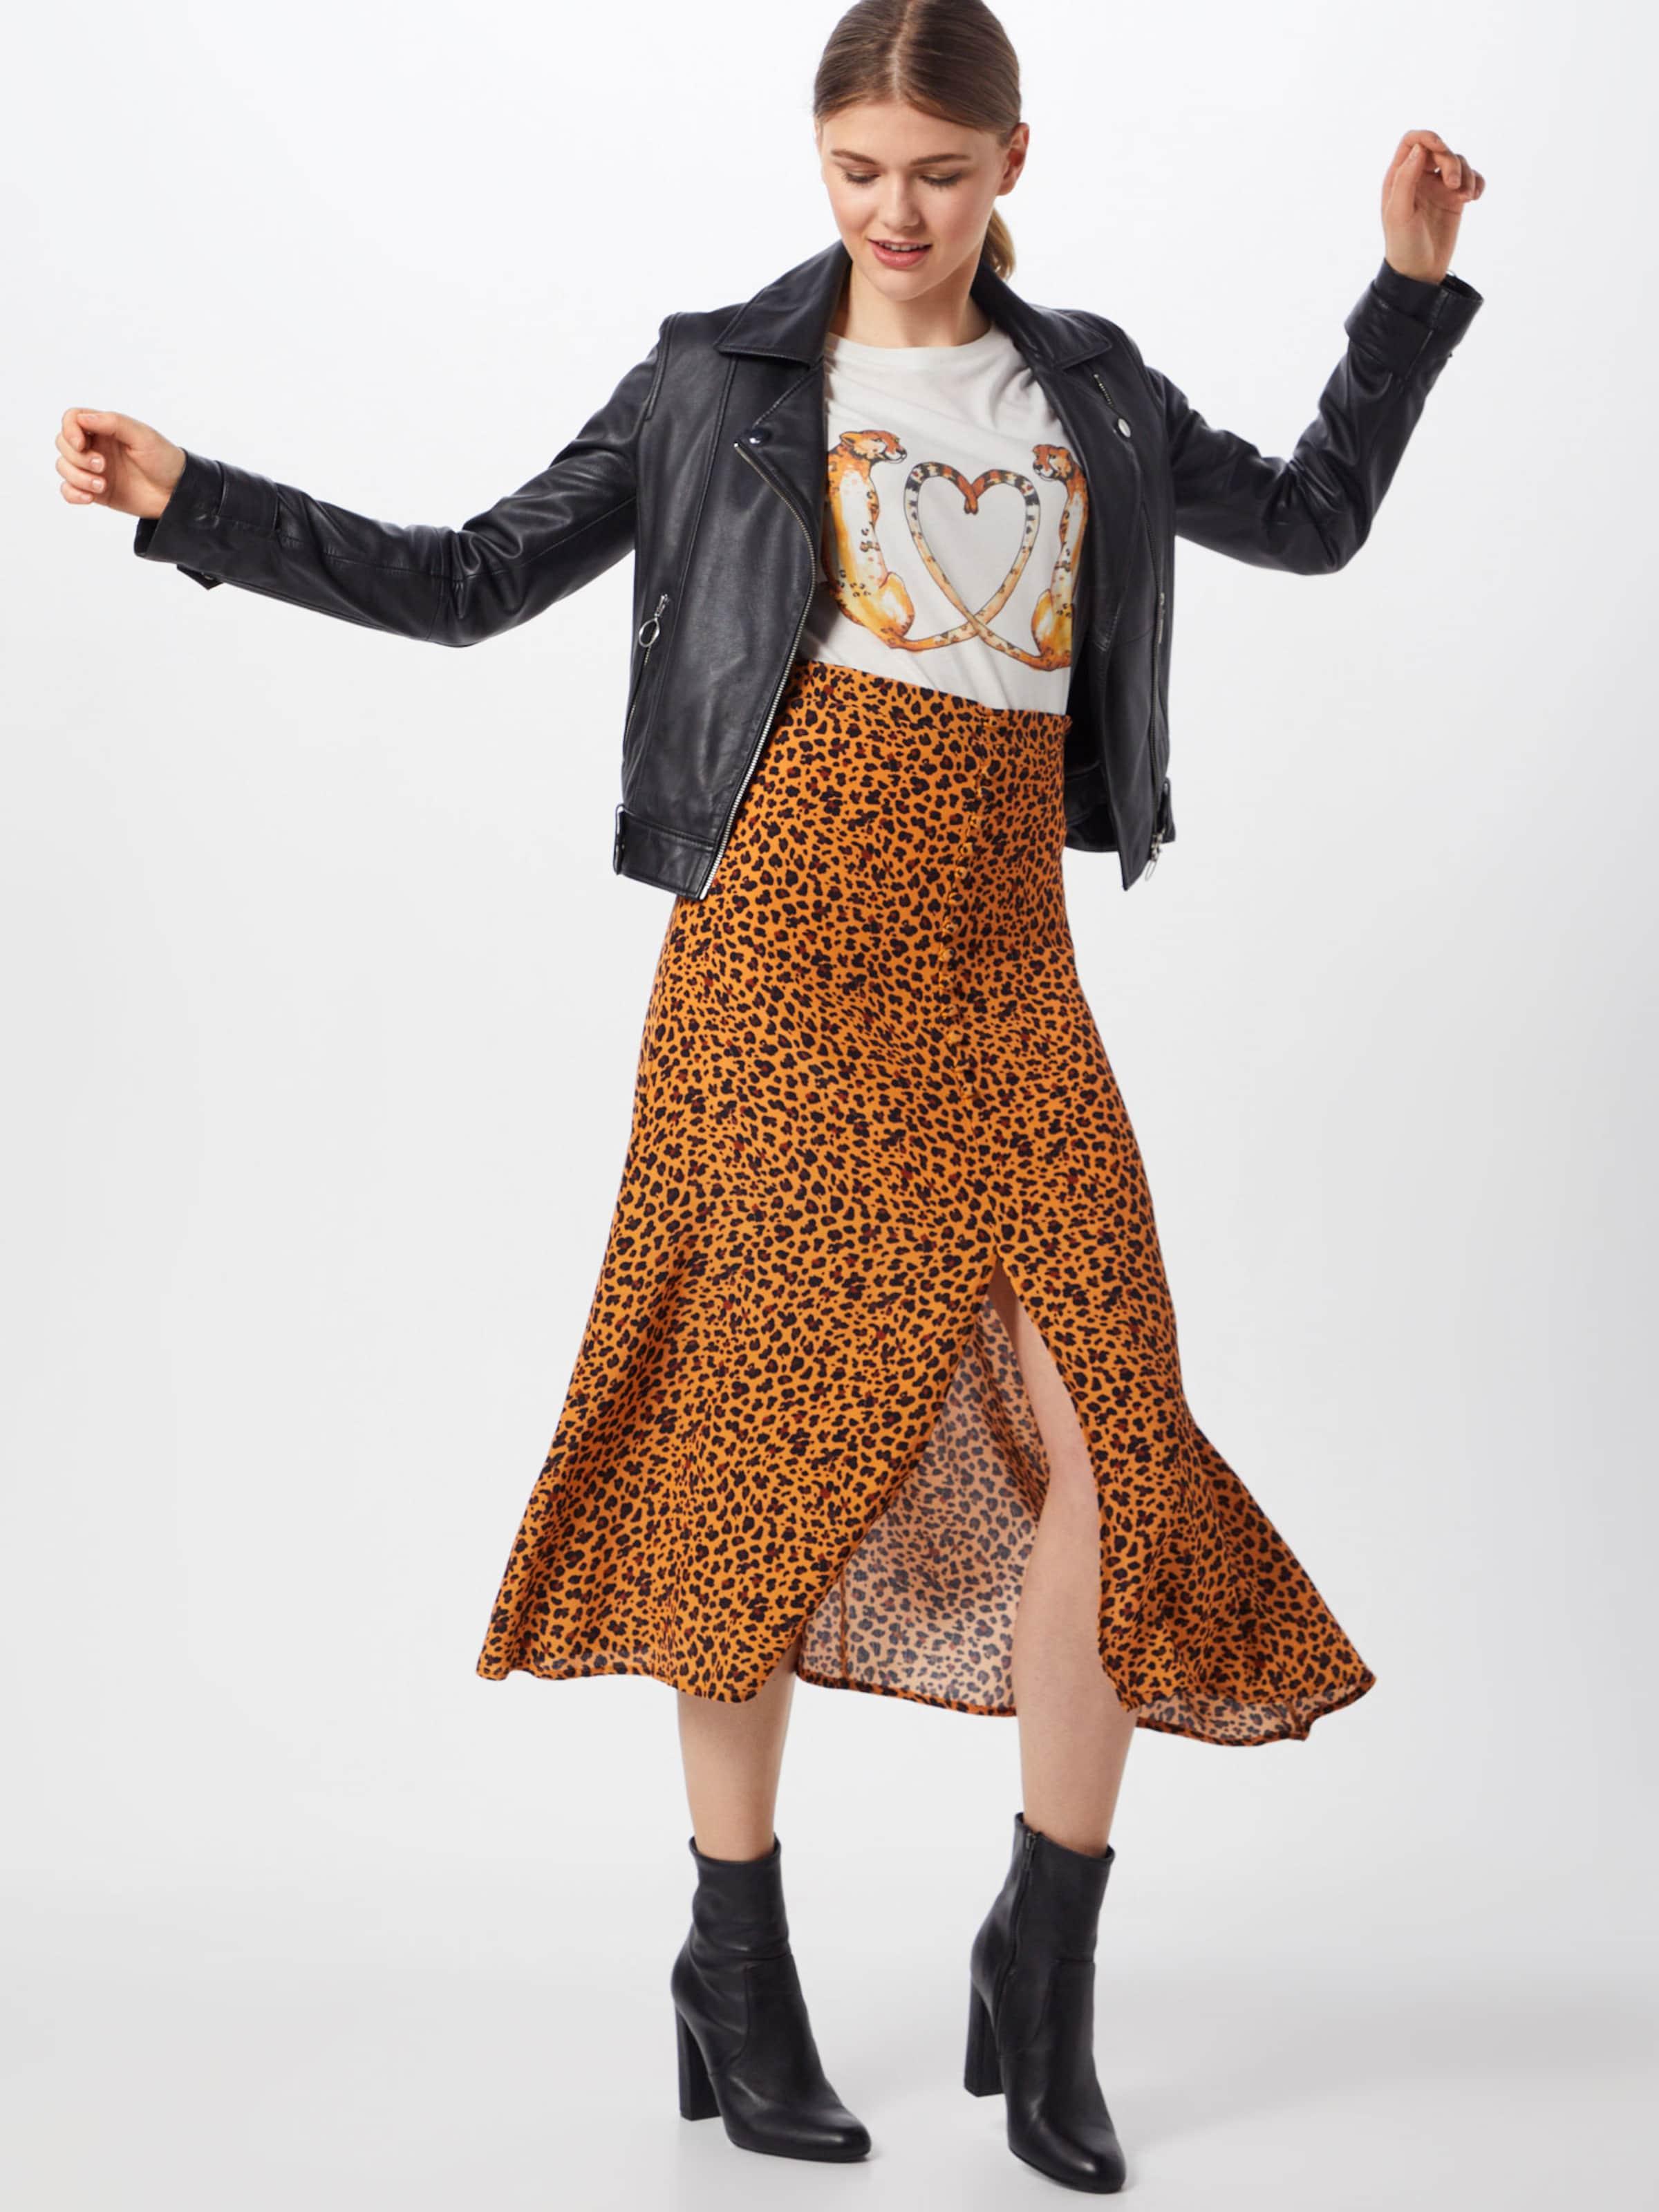 Cheetah 'ts Shirt Catwalk Weiß Love' In Junkie PkO80nw